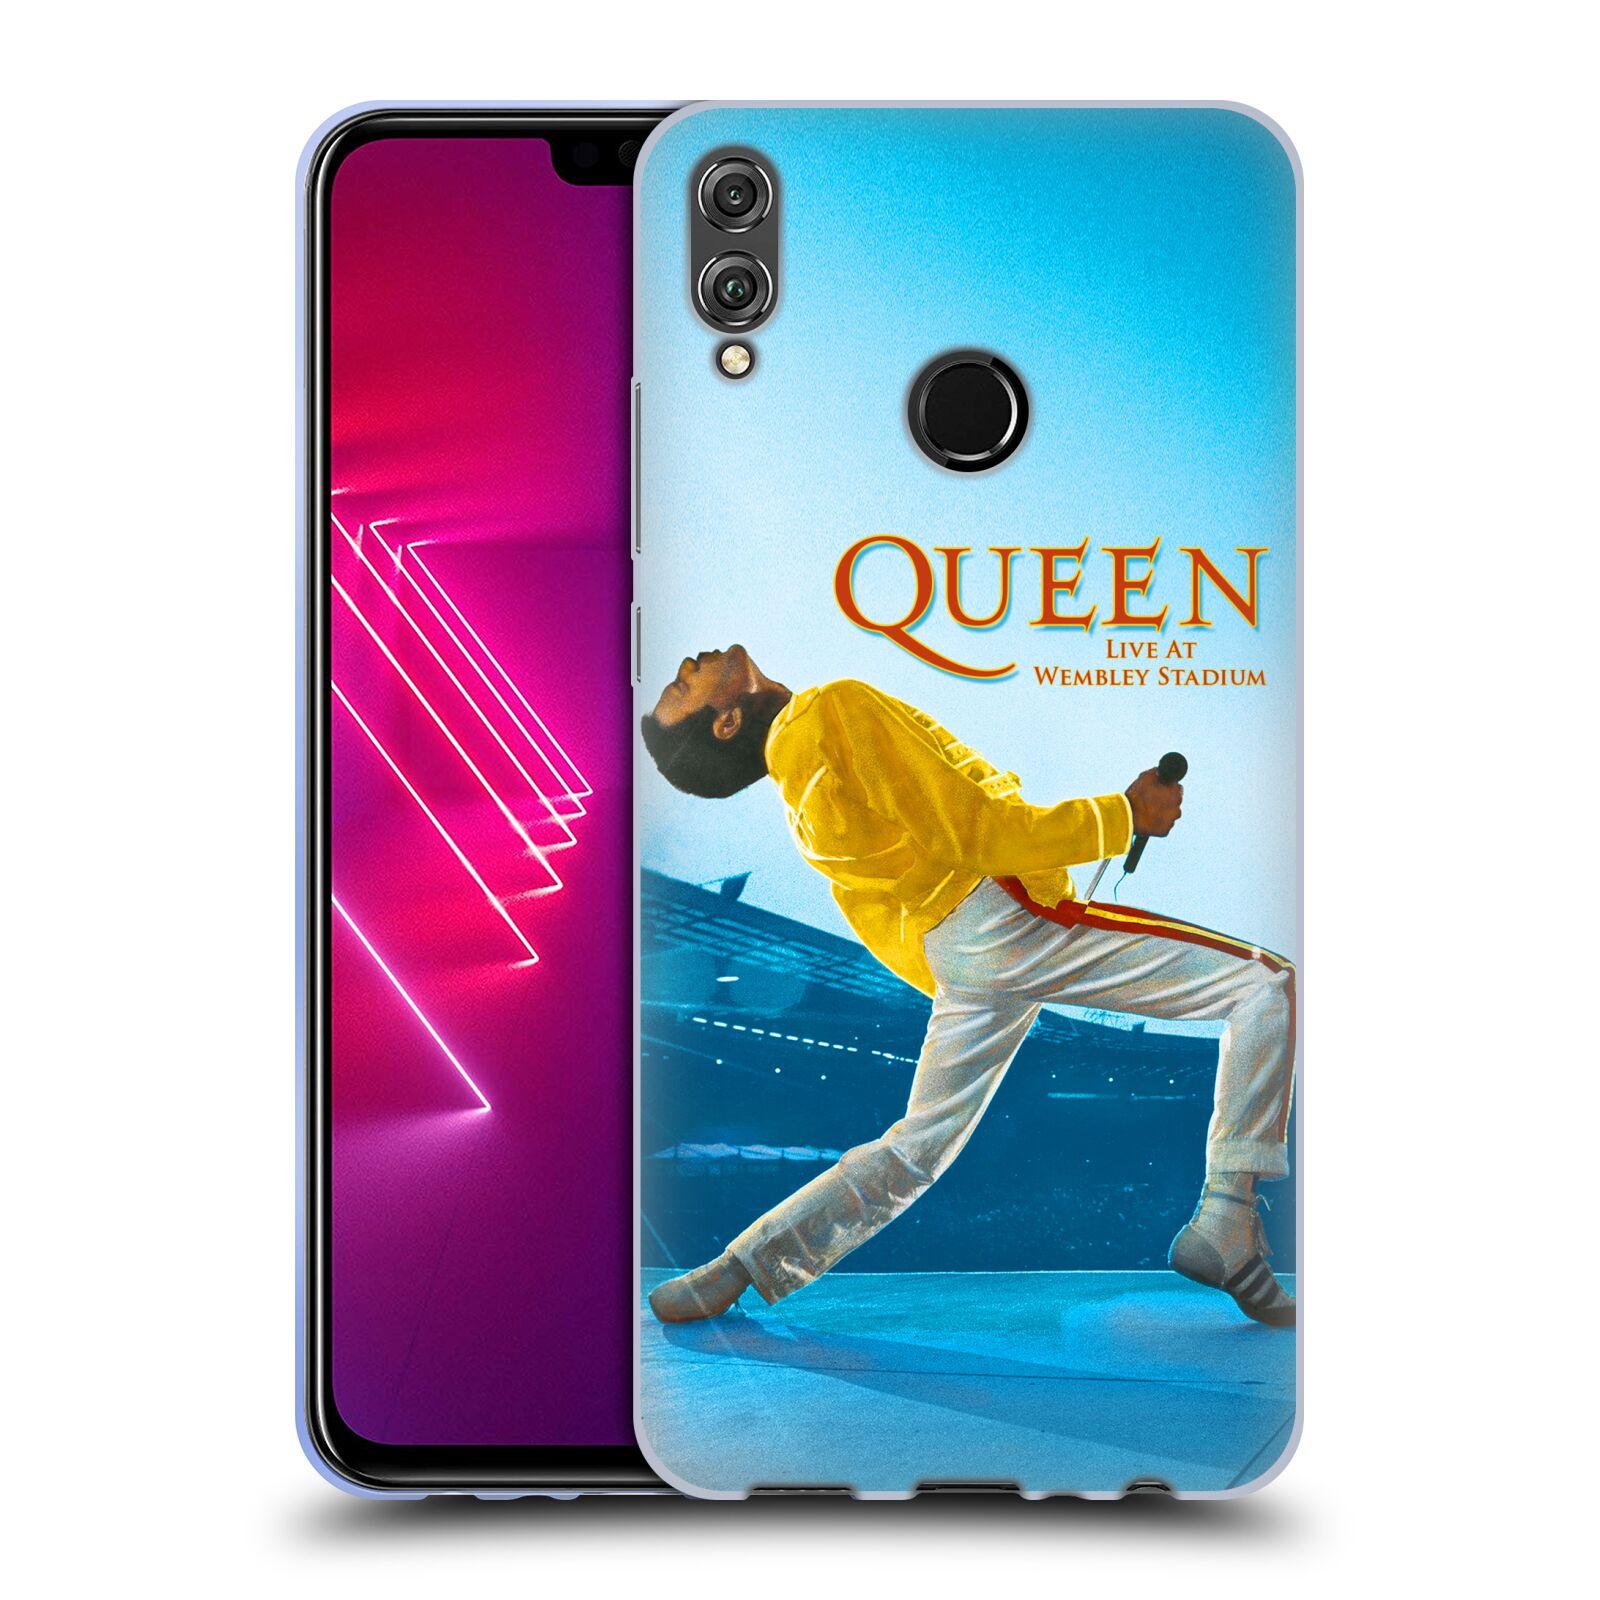 Silikonové pouzdro na mobil Honor View 10 Lite - Head Case - Queen - Freddie Mercury